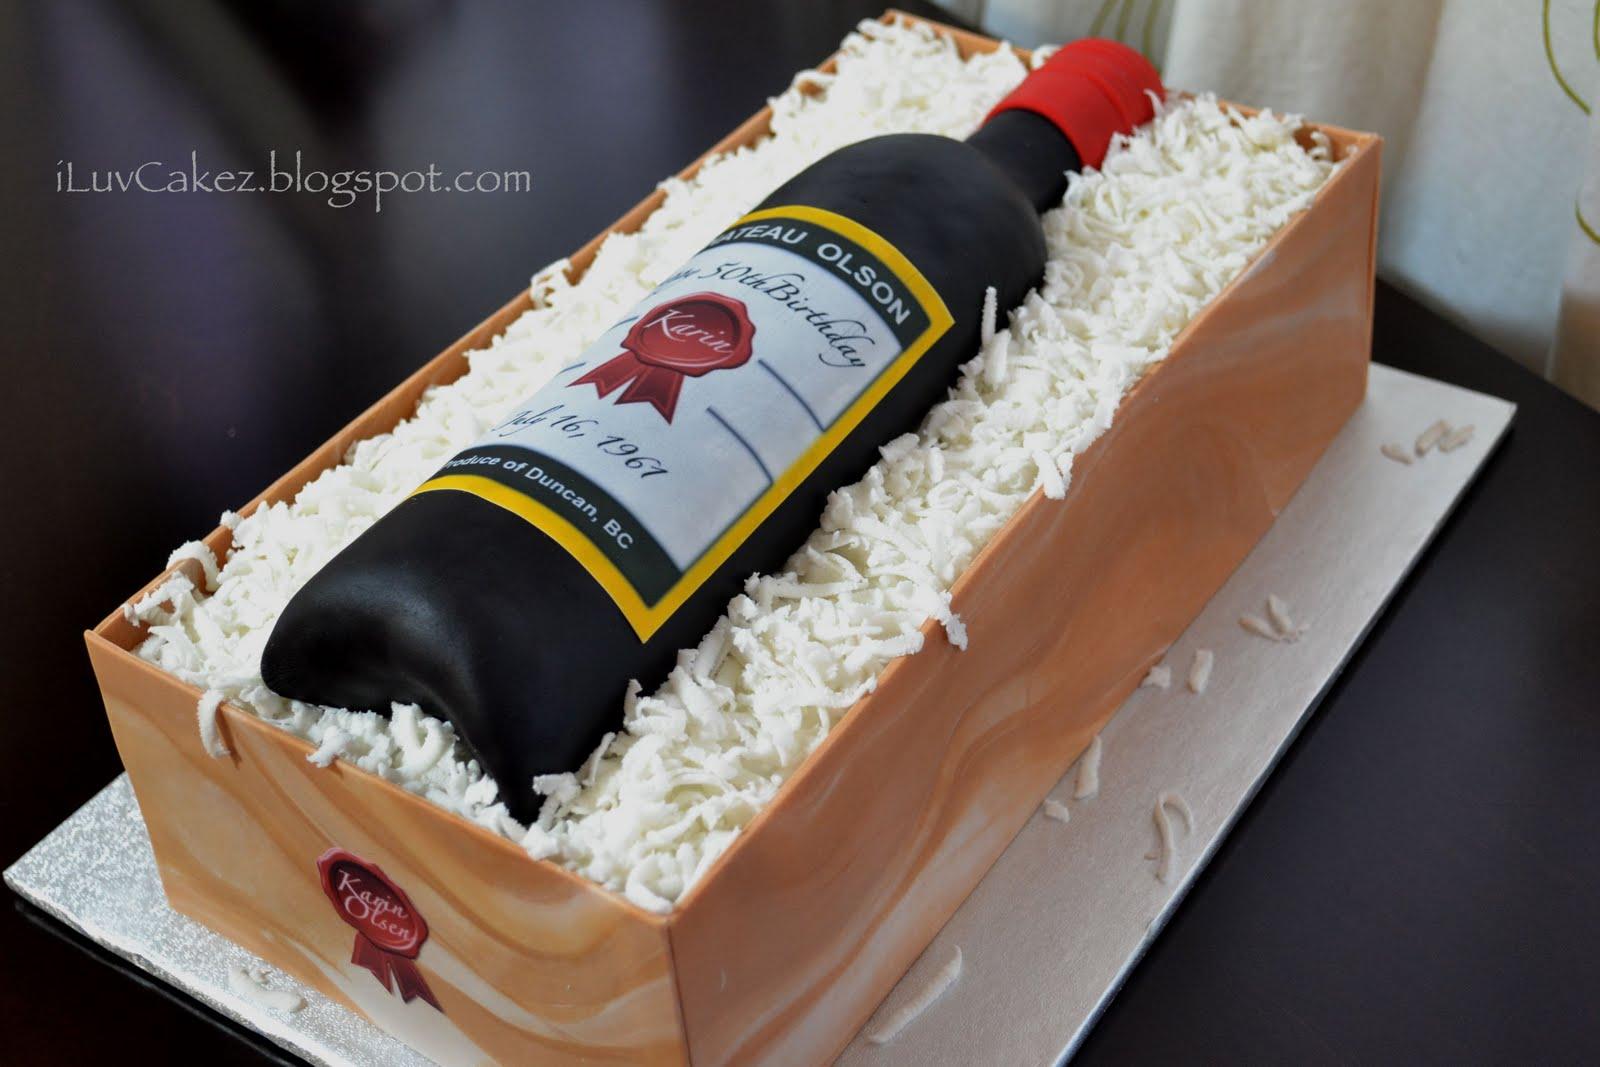 Iluv Cakez Wine Bottle Cake Karins Birthday Cake